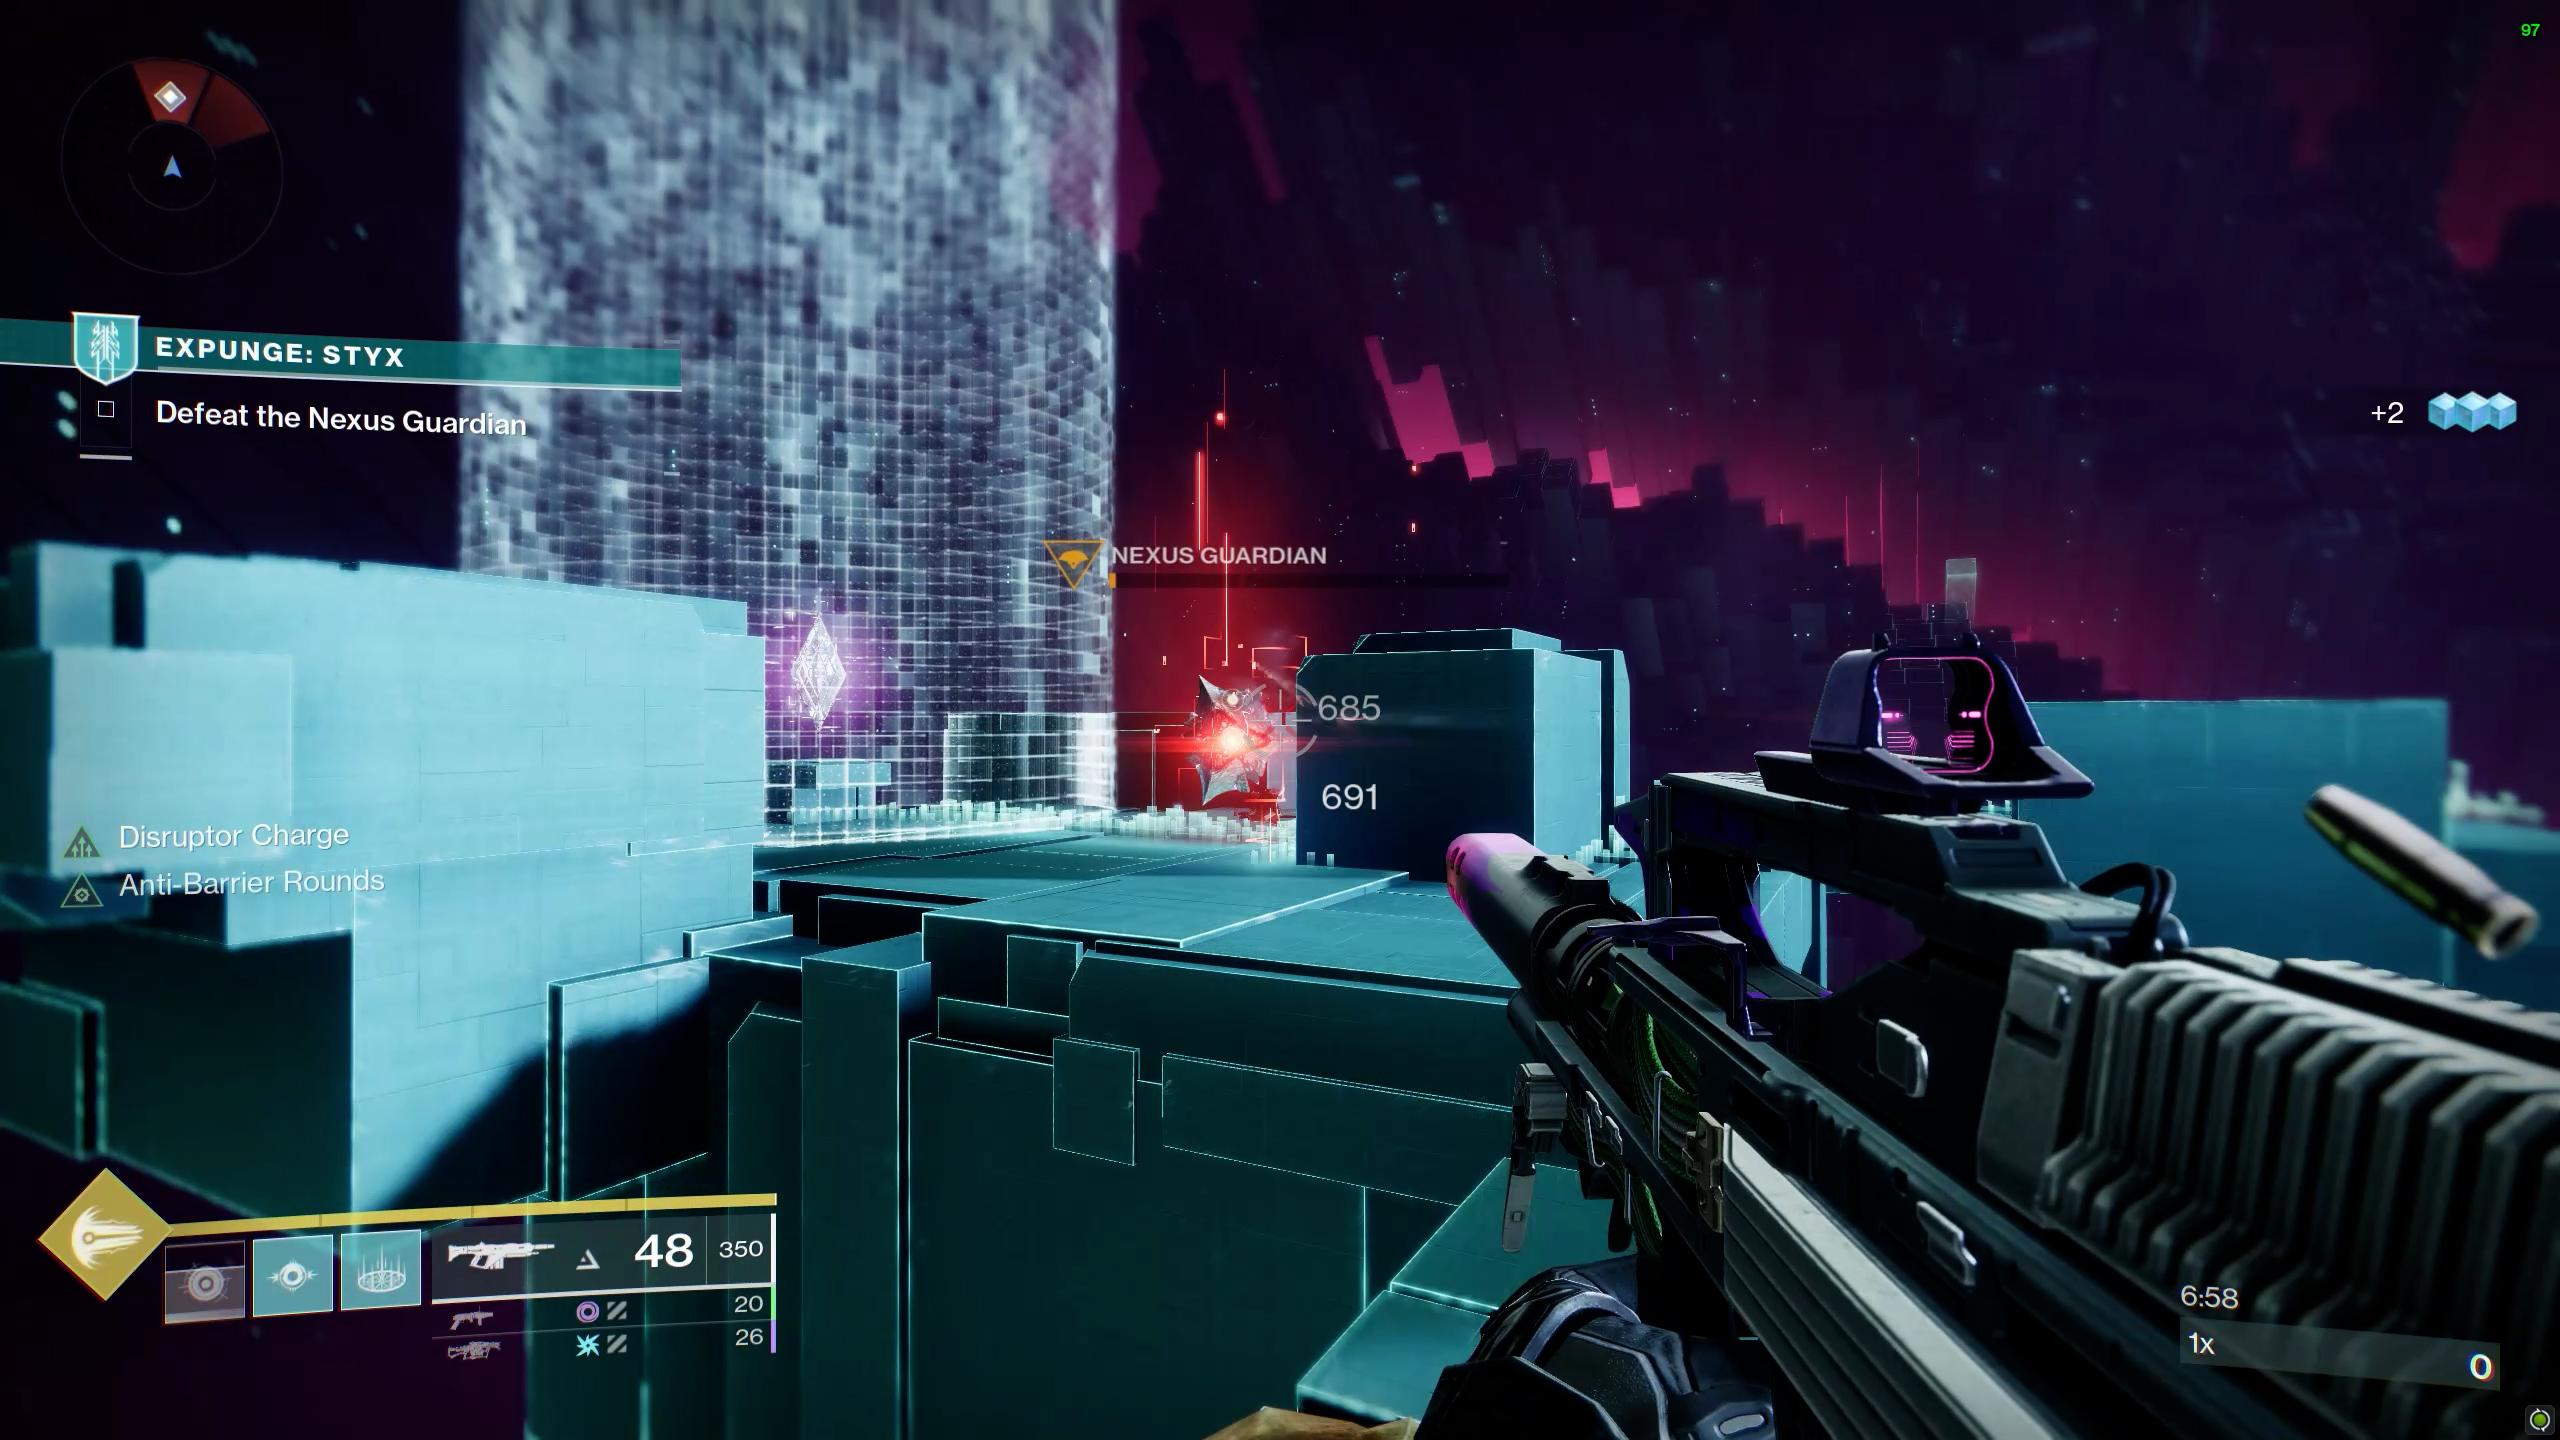 destiny 2 expunge styx nexus guardian